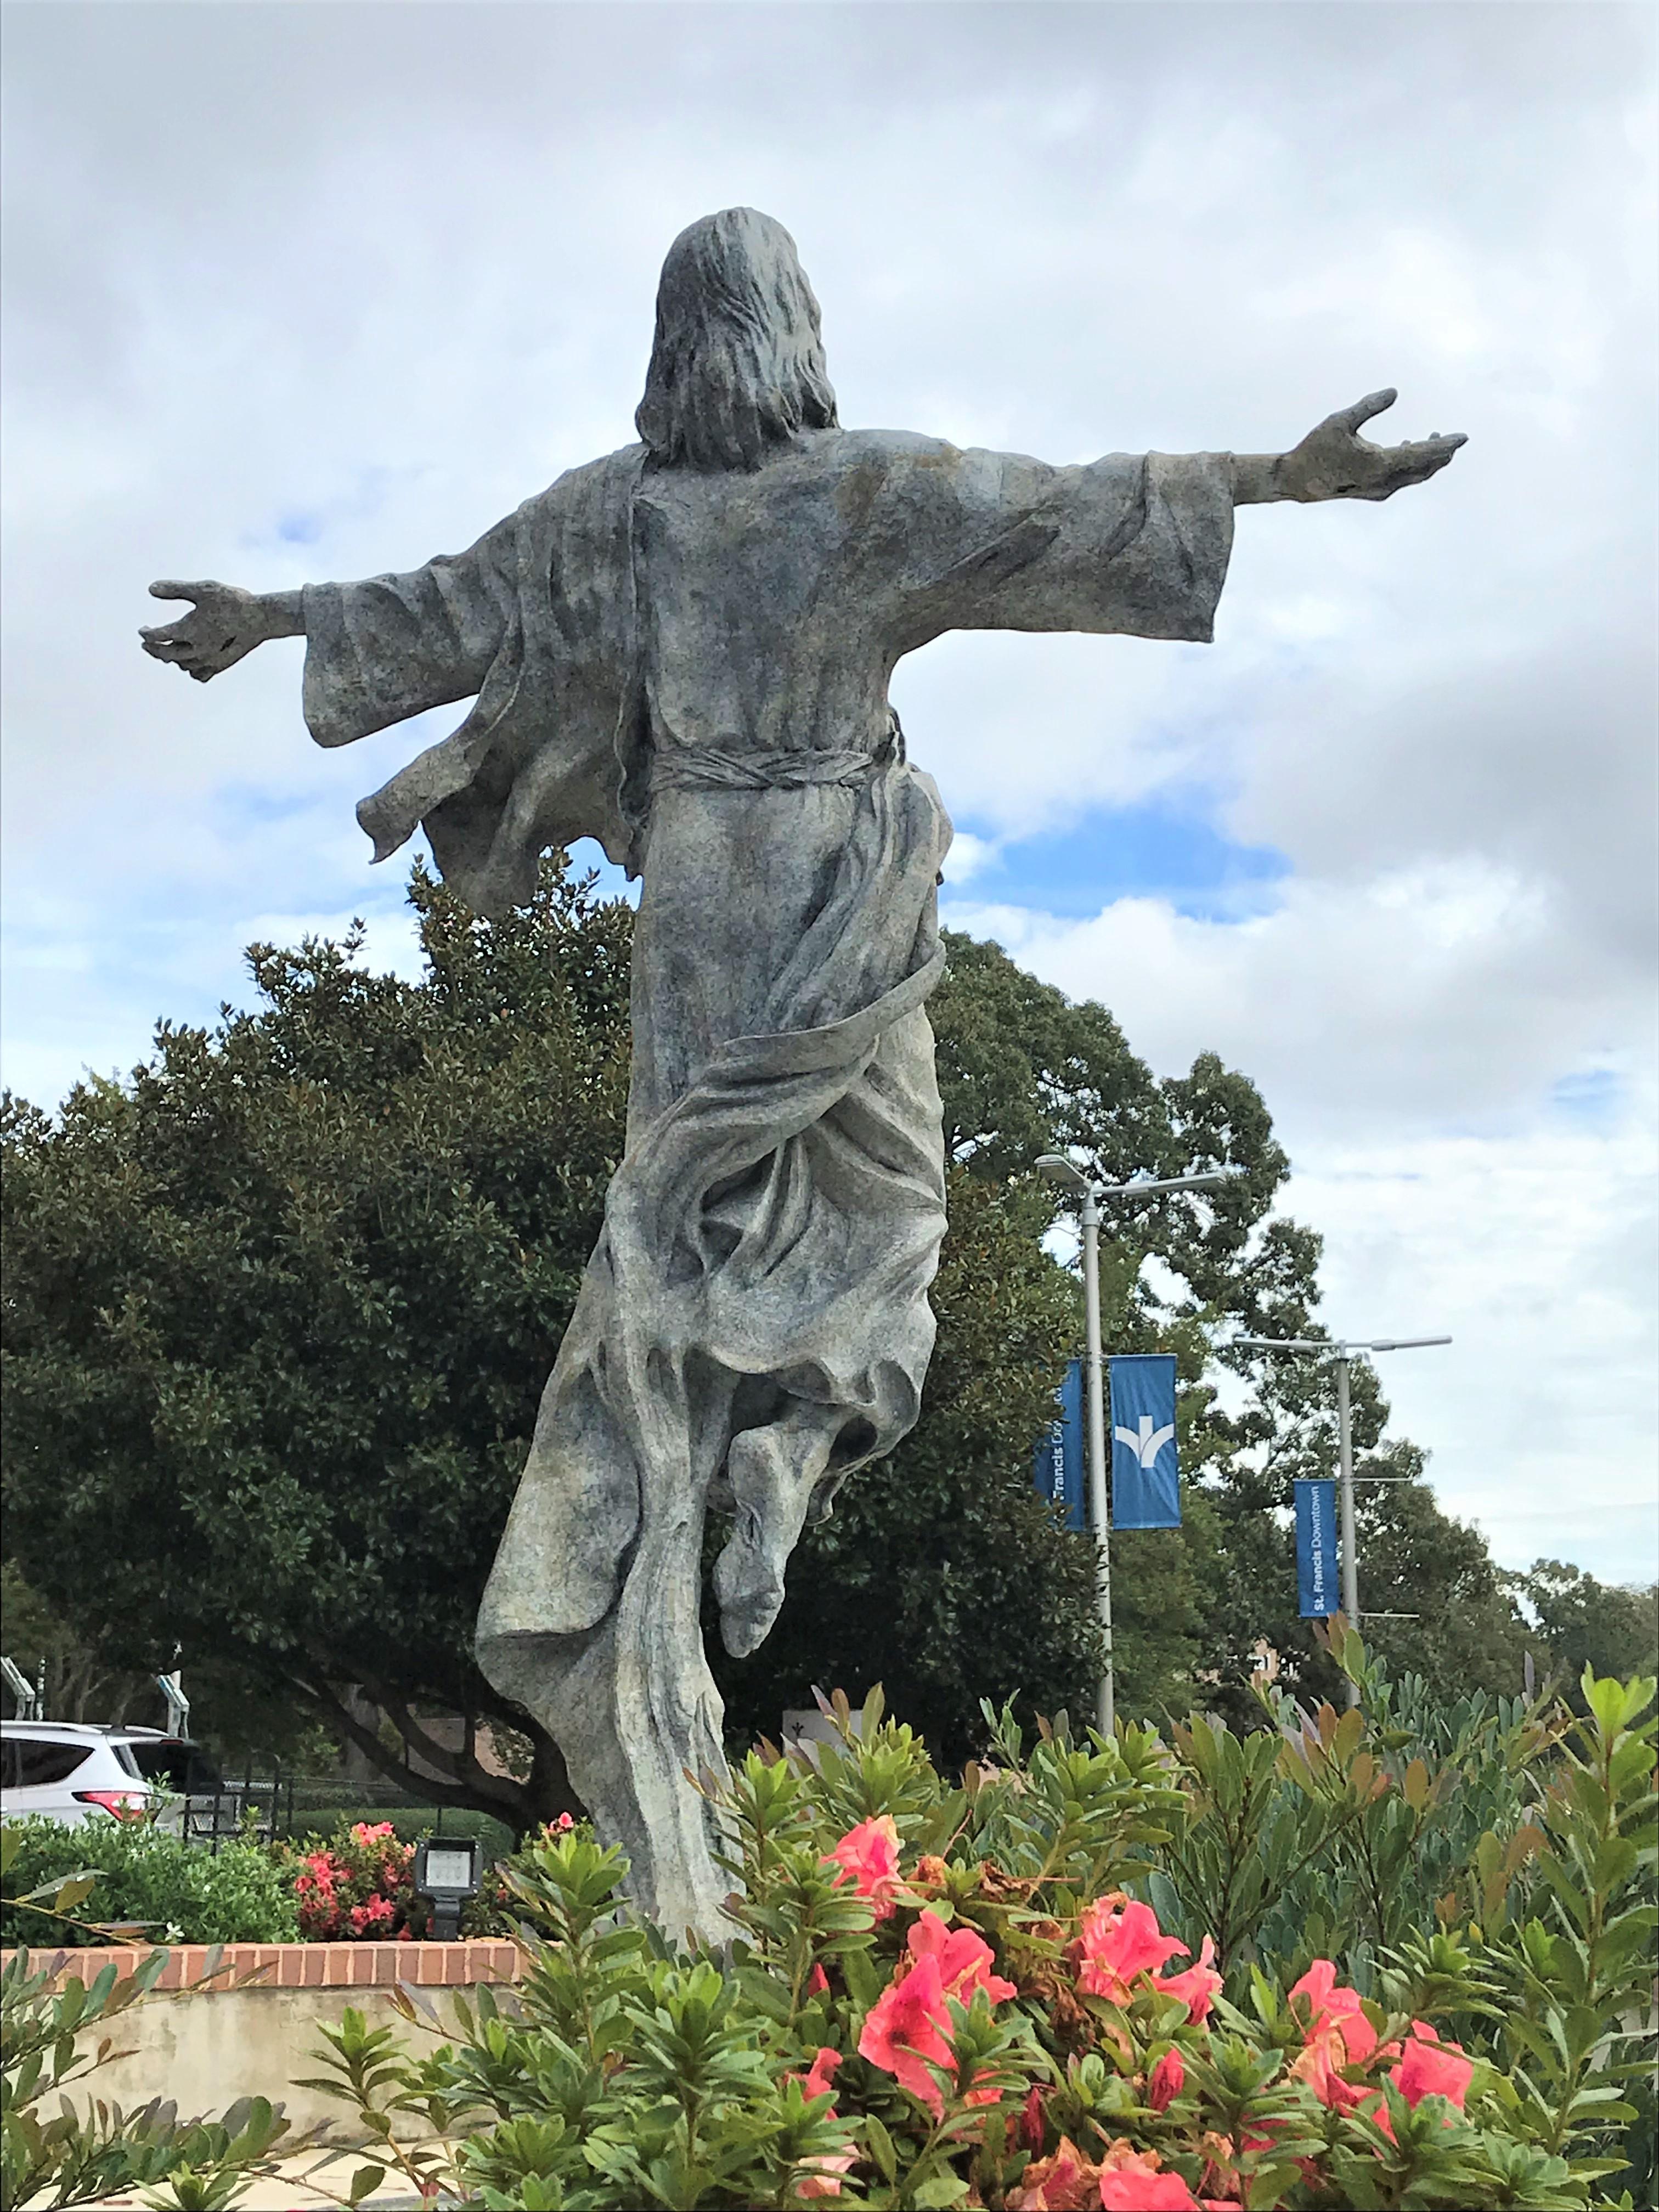 greenville, sculpture, artist, south carolina, sc, monument, christian, jesus, catholic, christ, sacred